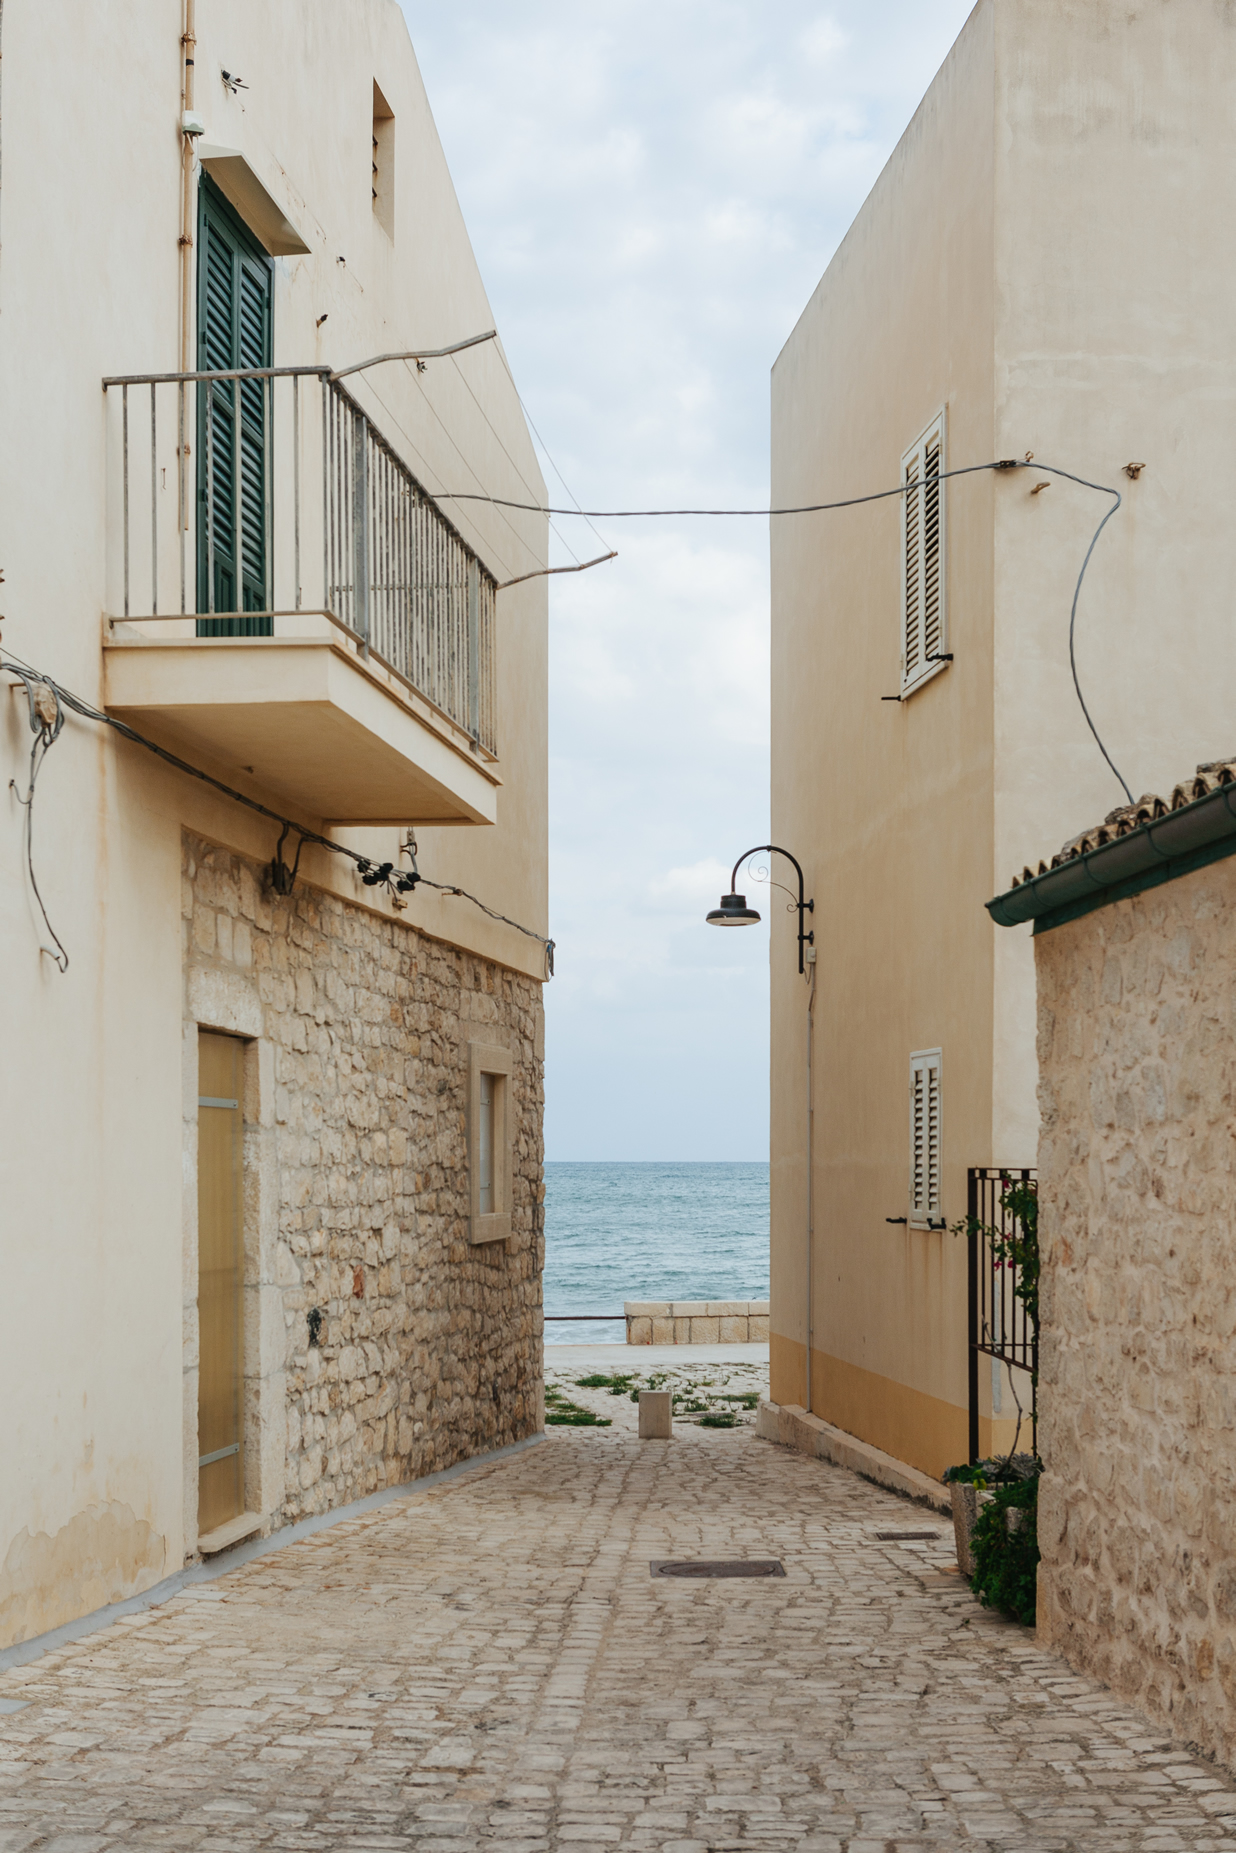 25sampieri-casa-vacanze-sicilia-appartamento-sicily-holiday-apartment-casa-di-pietra-italia-italy.jpg